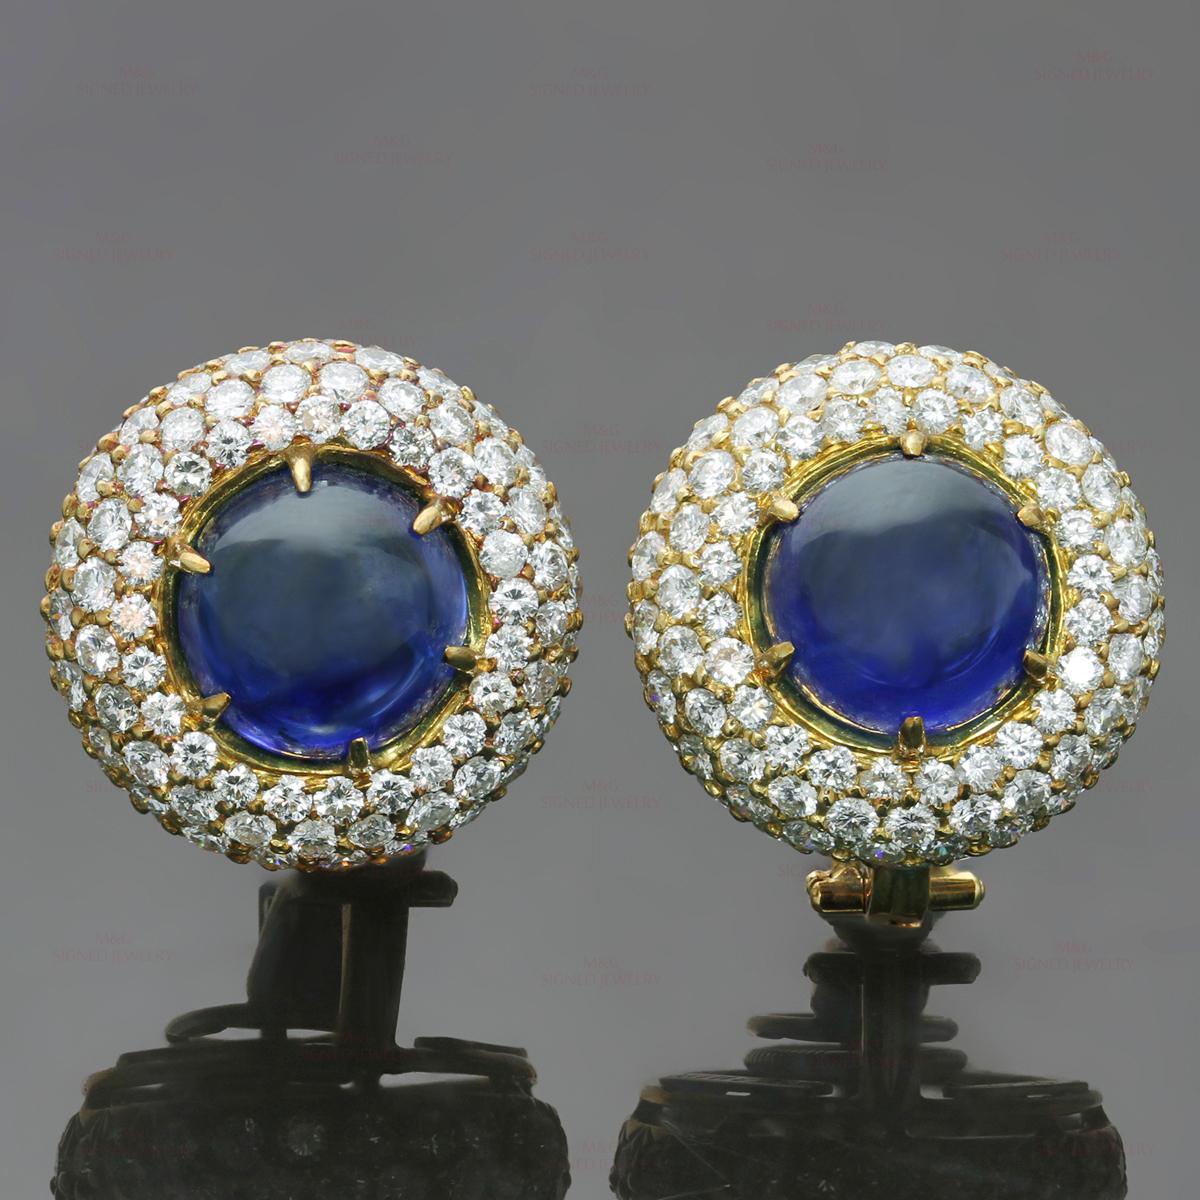 Harry Winston Exquisite Diamond Blue Sapphire 18k Yellow